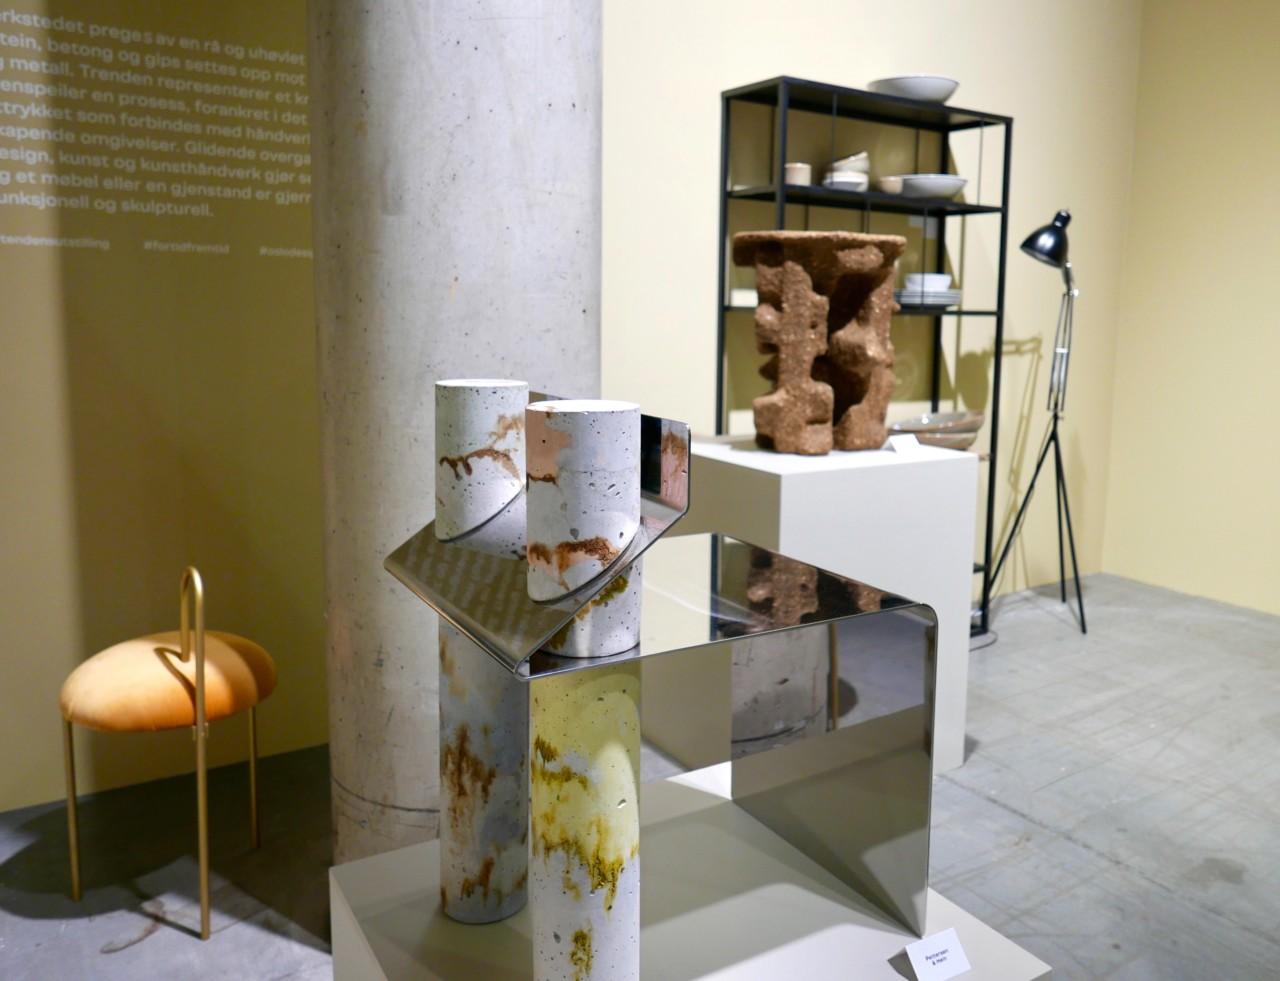 pettersen-hein tendencies workshop-oslo-design-fair